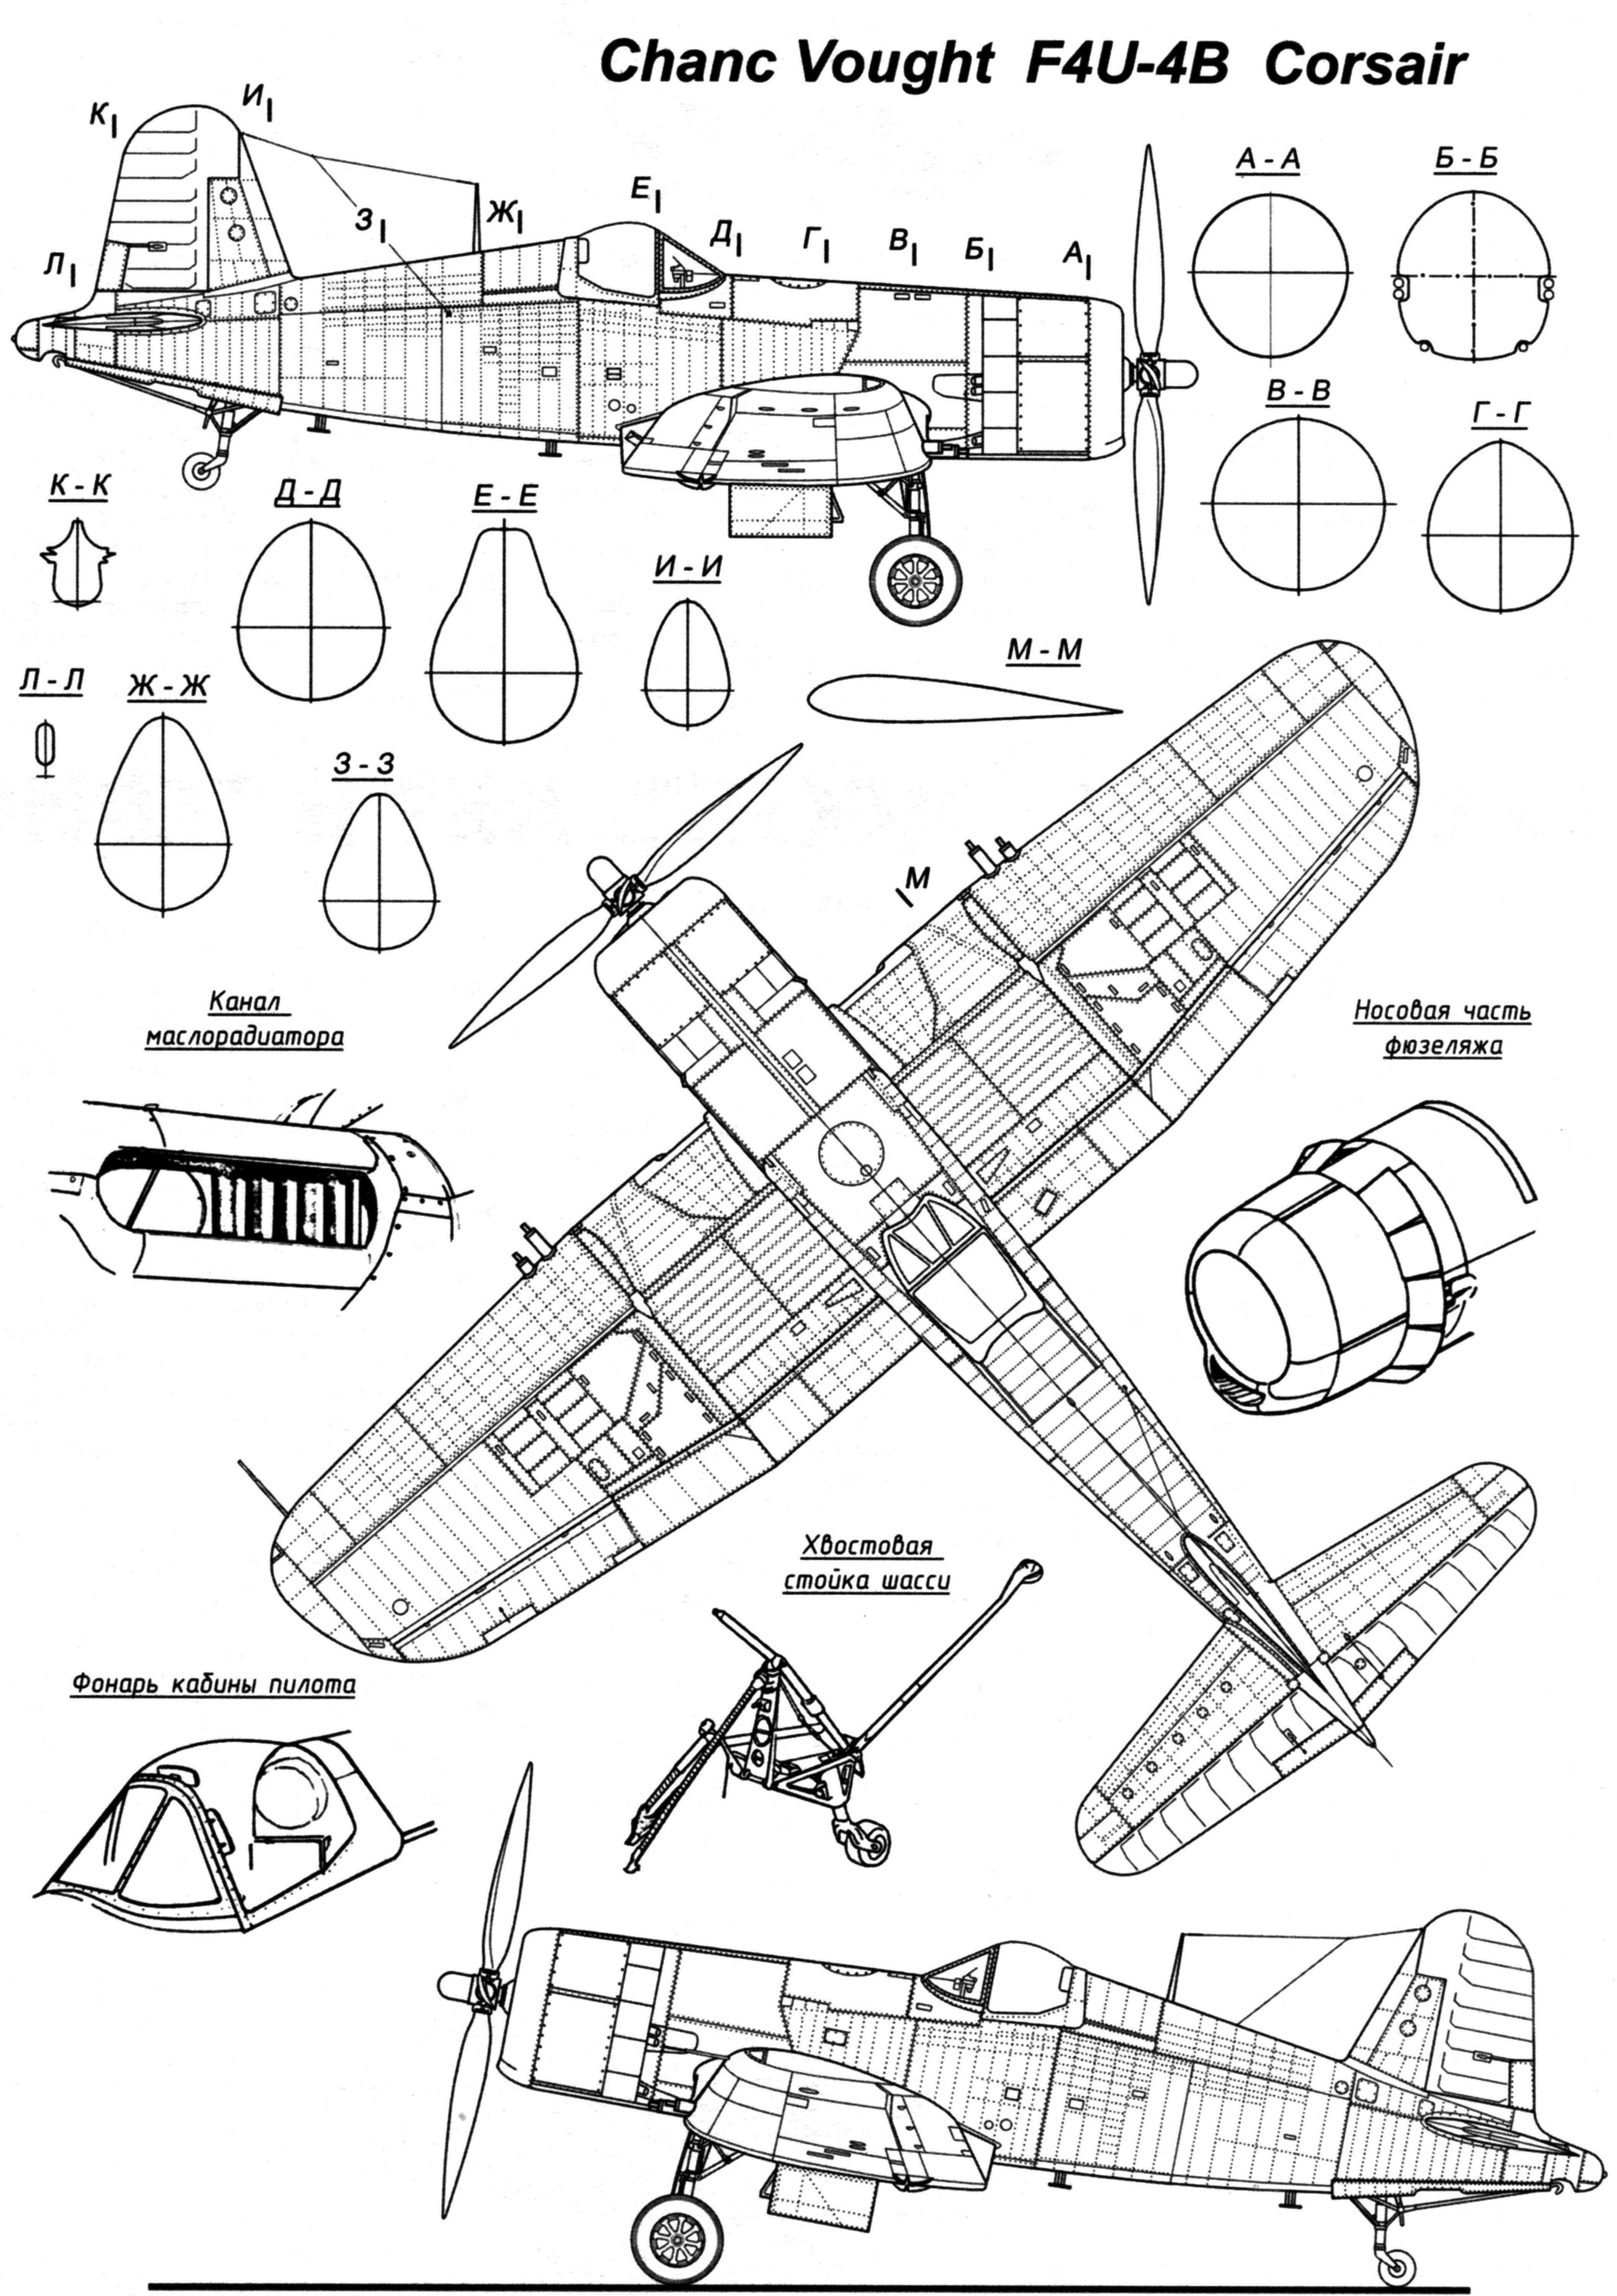 Chane Vought F4U-4B Corsair